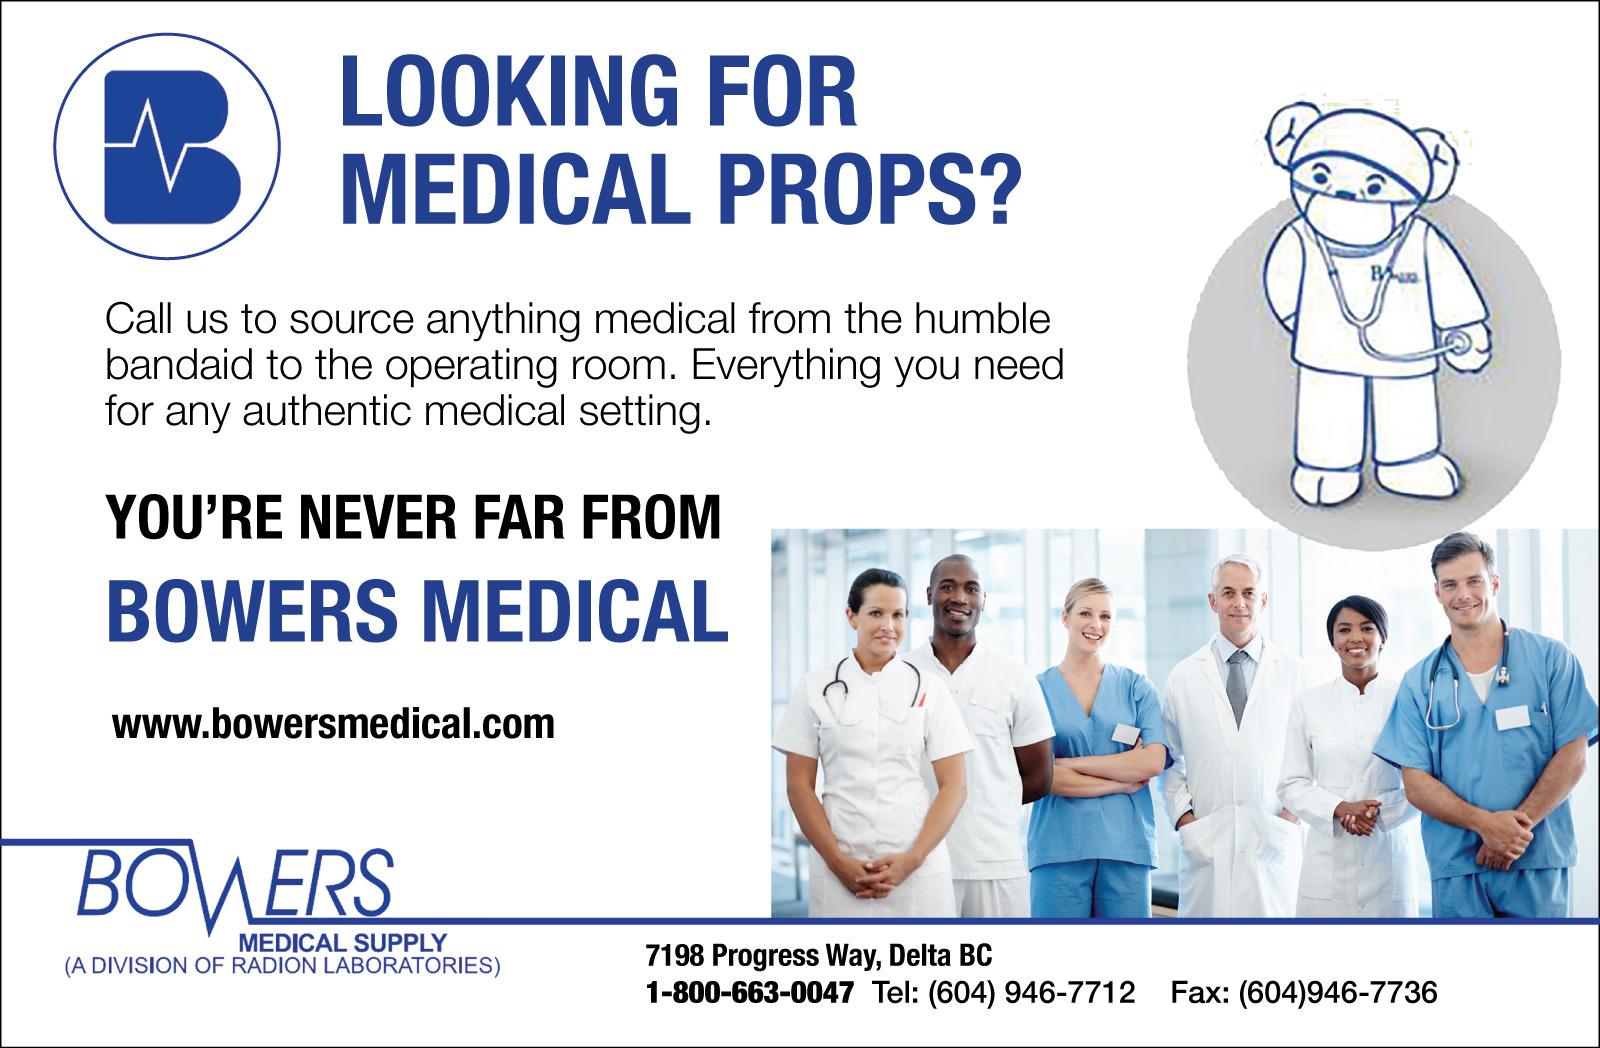 Bowers Medical Supply